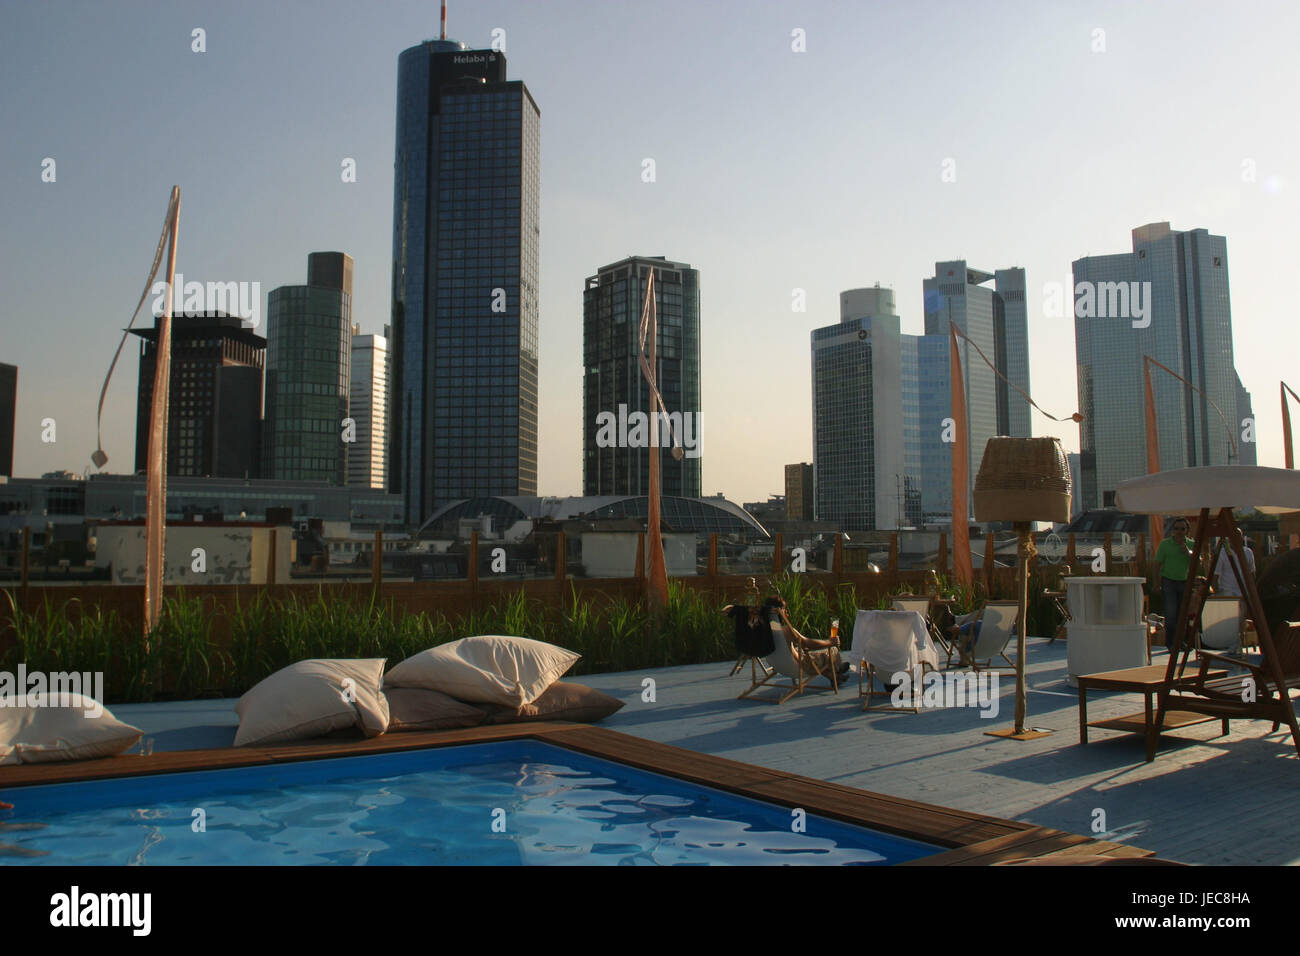 Germany, Hessen, Frankfurt on the Main, roof terrace, skyline, stage bar, bank fourth, Main metropolis, bar, sunshades, - Stock Image